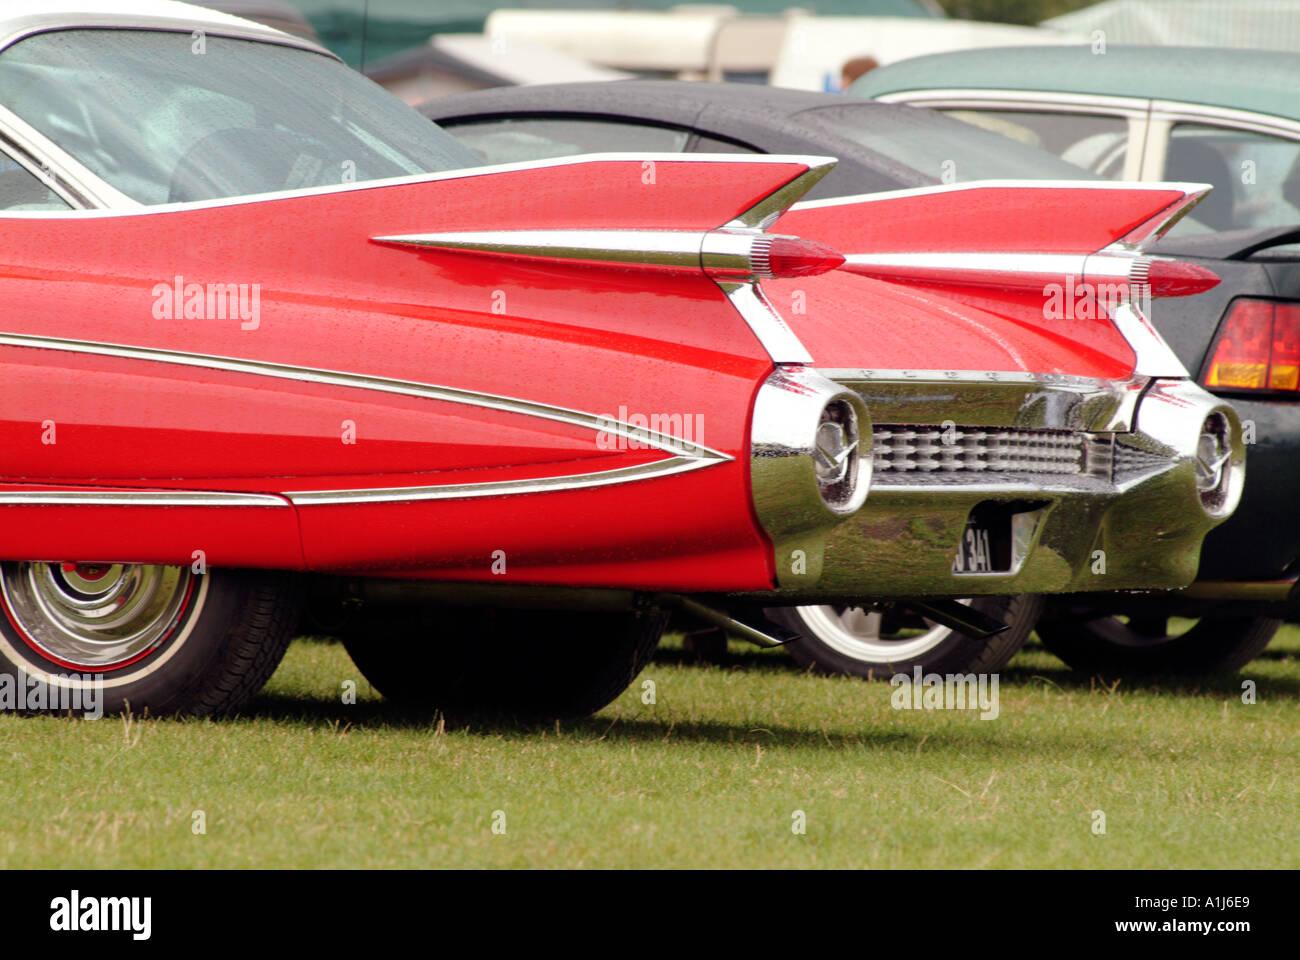 cadillac luxury car 1950 s 1959 v8 engine america american classic ...